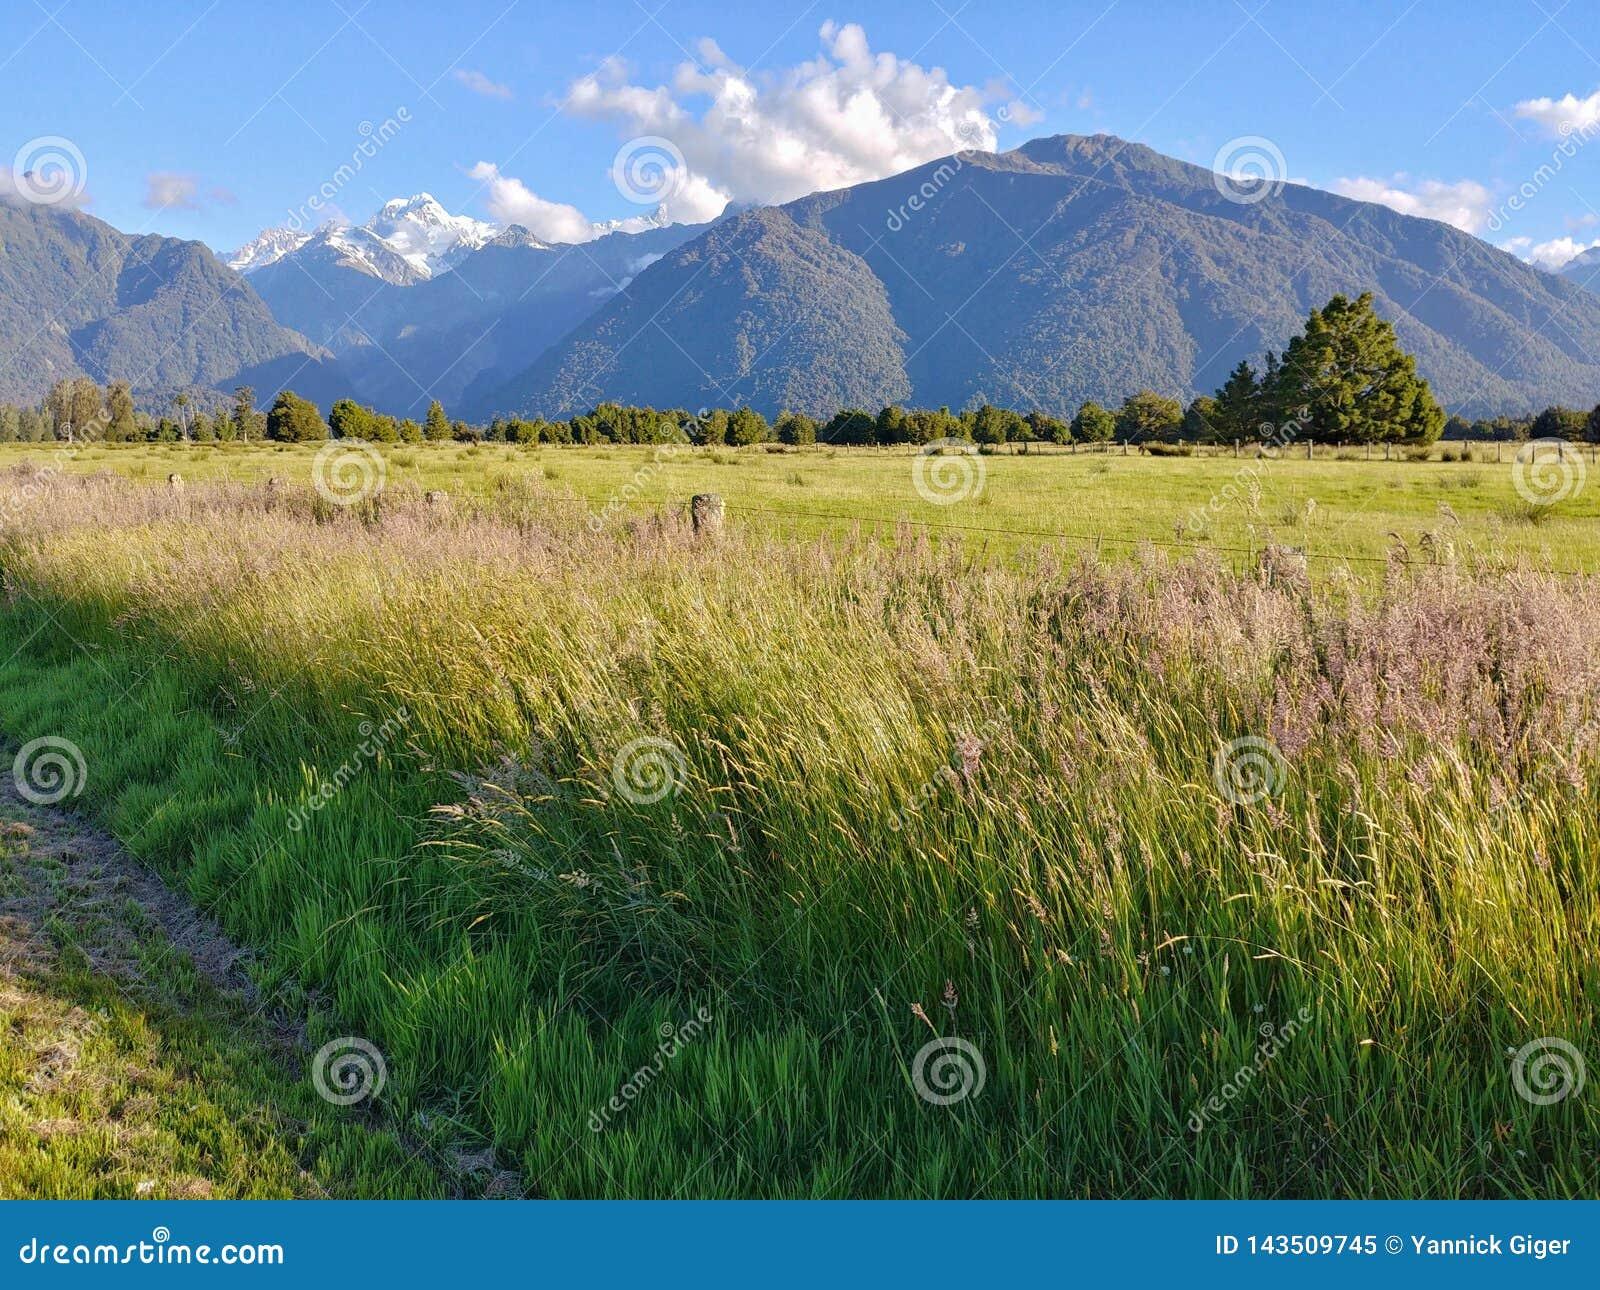 Aoraki Mount Cook behind a huge grassland